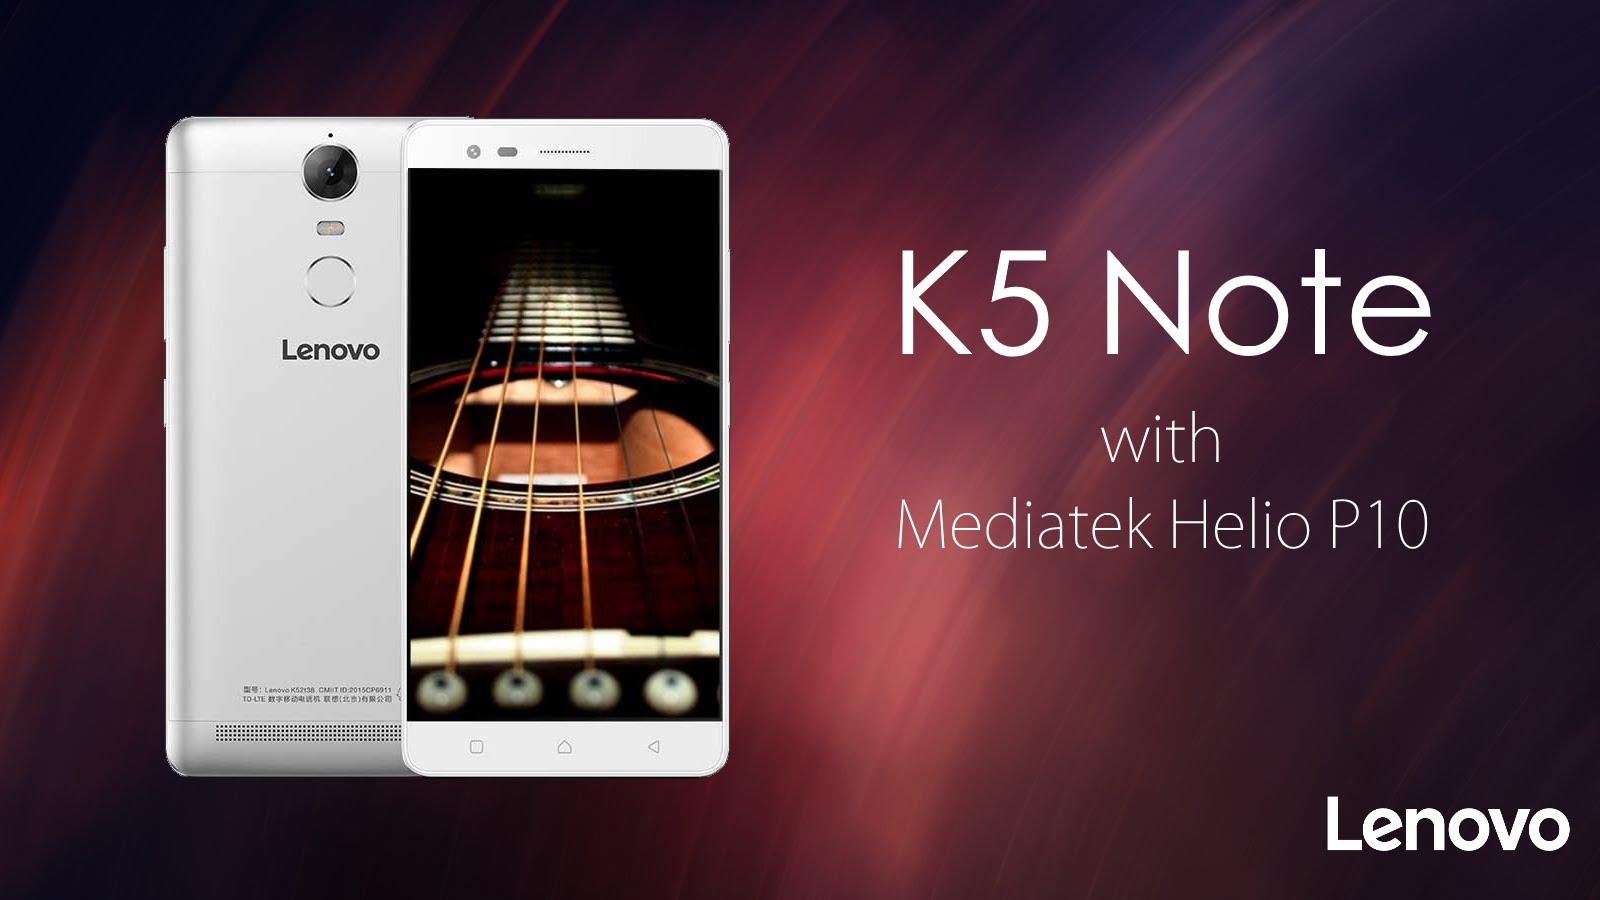 Lenovo K5 Note Usung Chipset MediaTek Helio P10 1